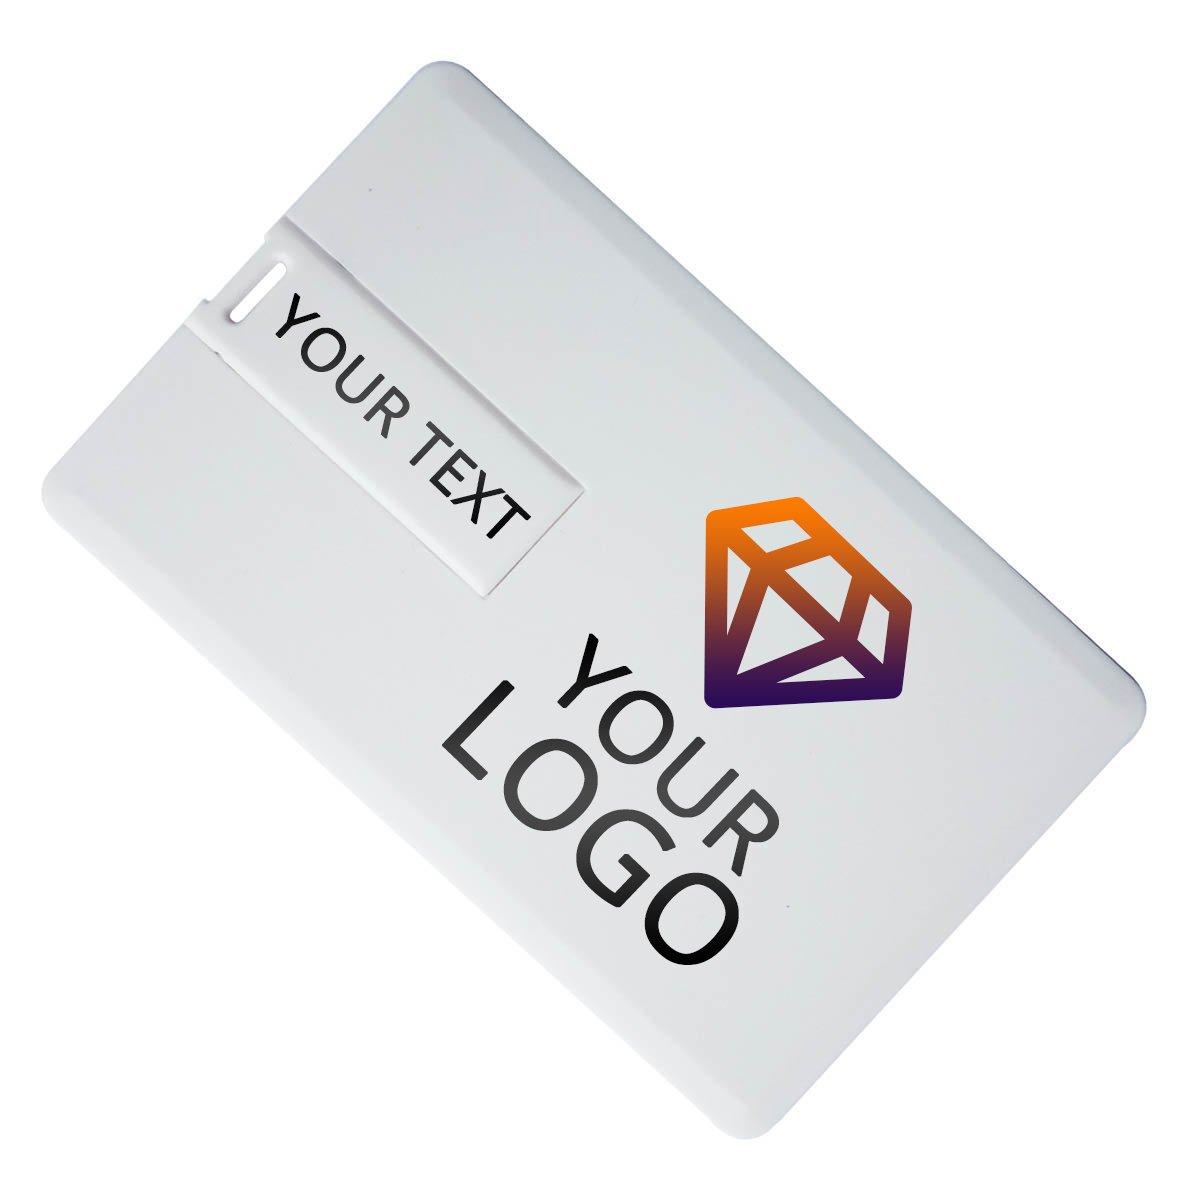 Custom Printed Business Card USB Flash Drive 100 PCs (16GB)